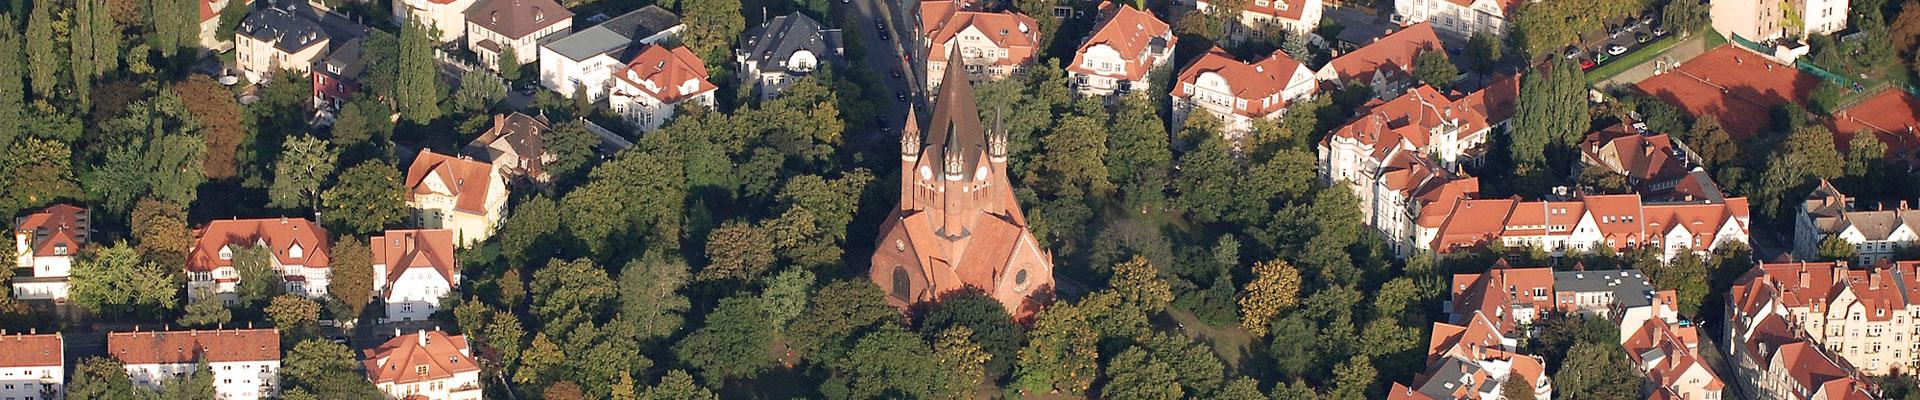 berner* Sachverständige halle-saale-header Halle (Saale)